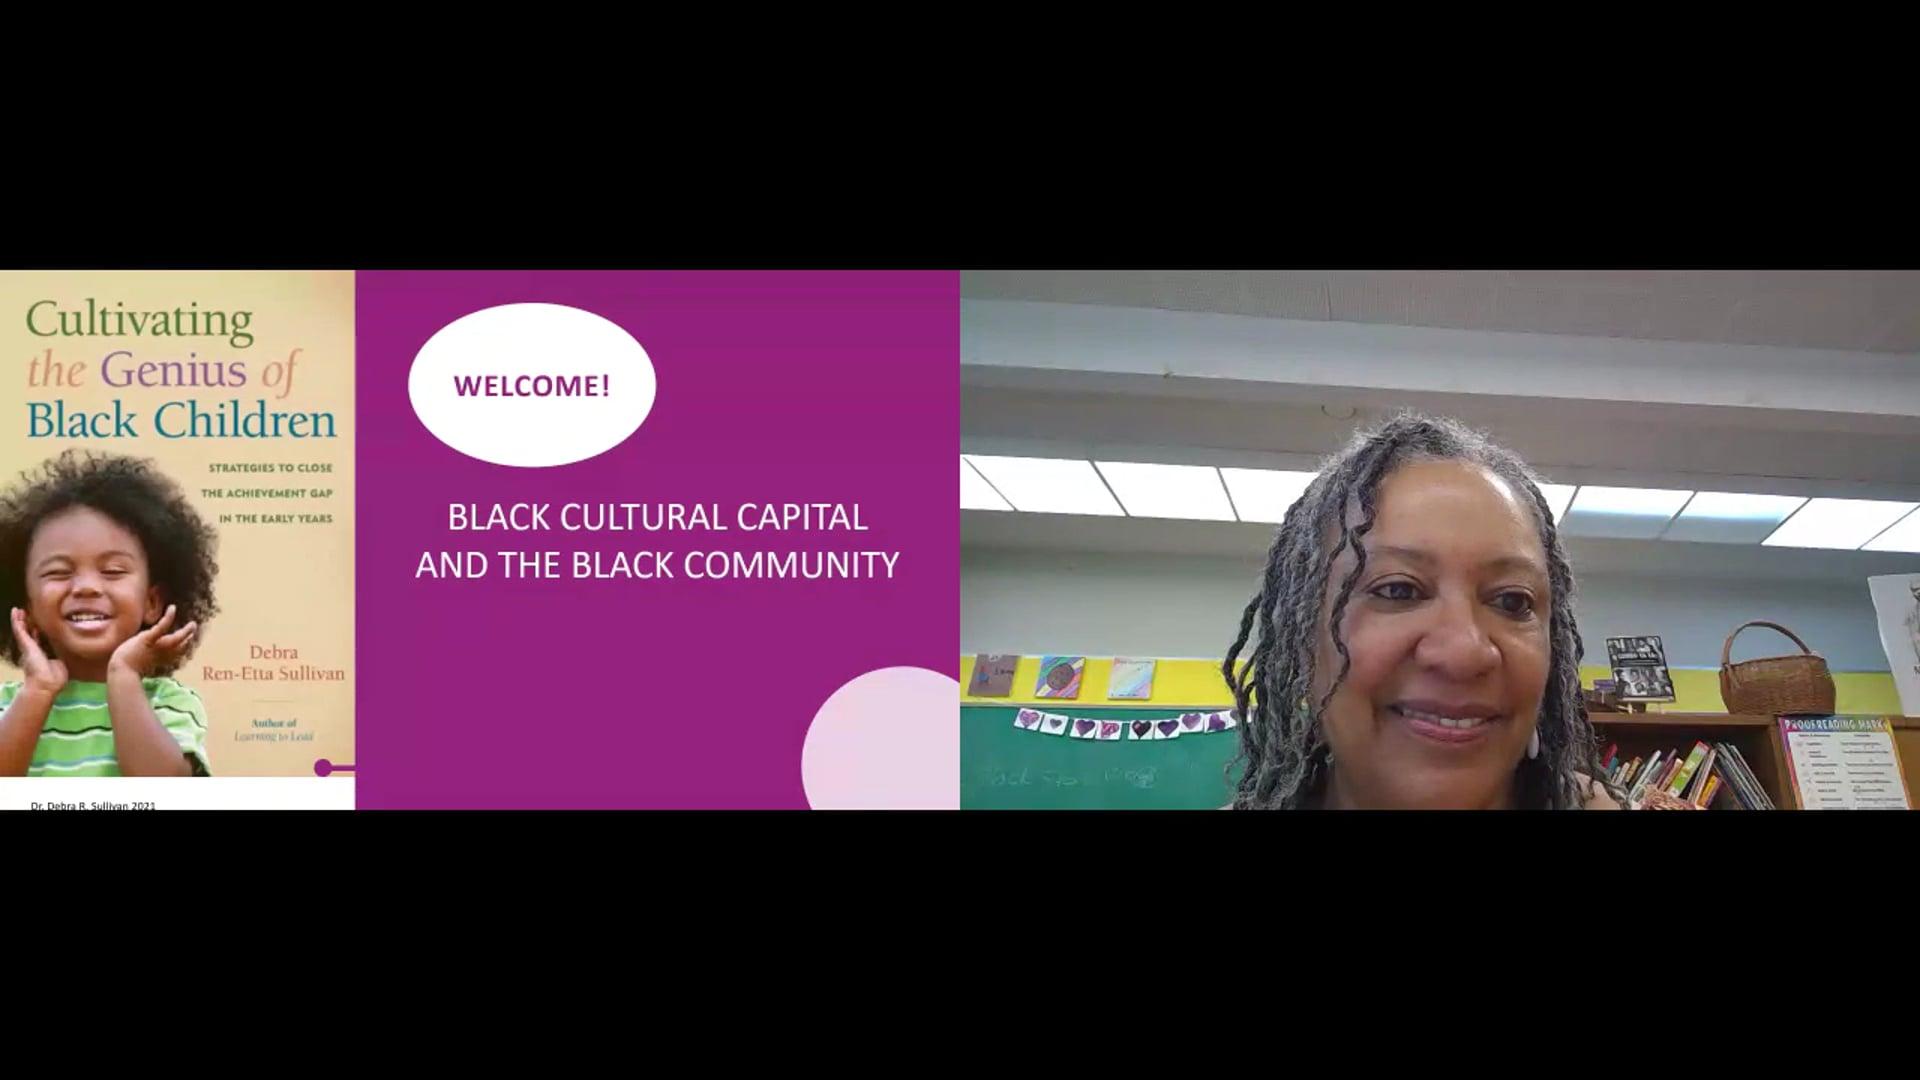 Black Cultural Capital and the Black Community